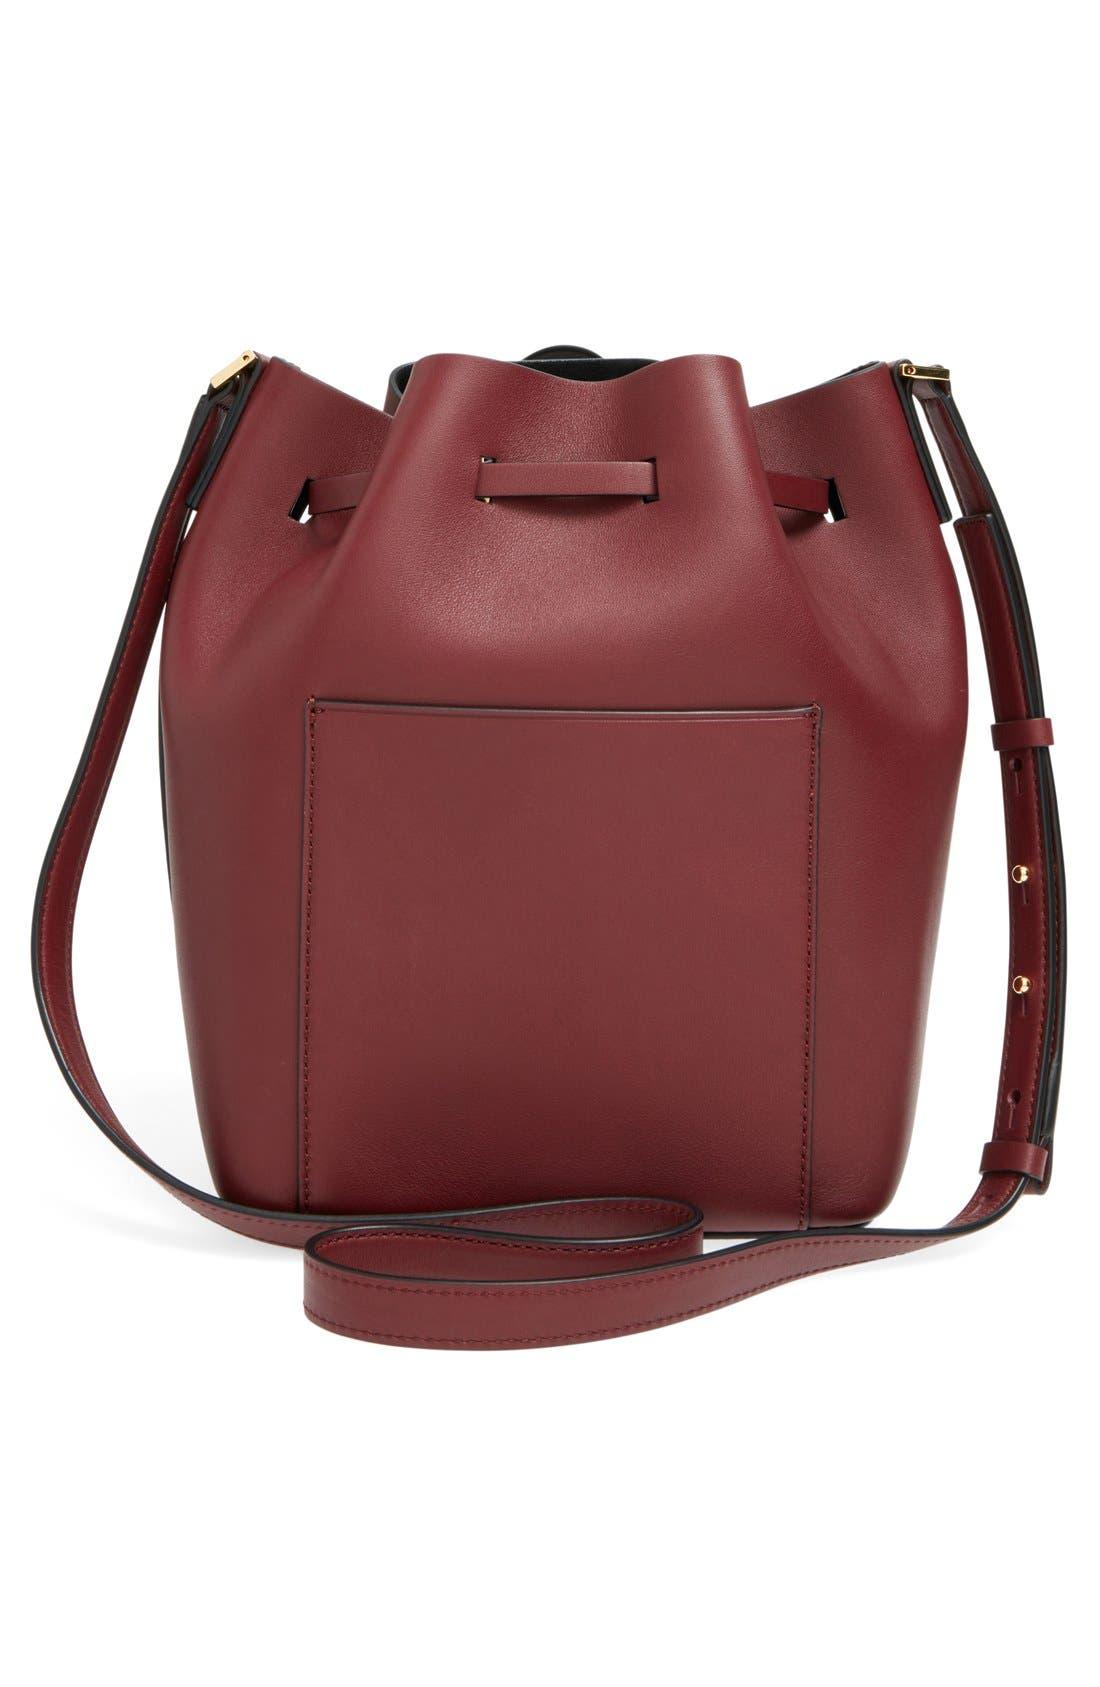 Alternate Image 3  - Michael Kors 'Medium Miranda' Bucket Bag